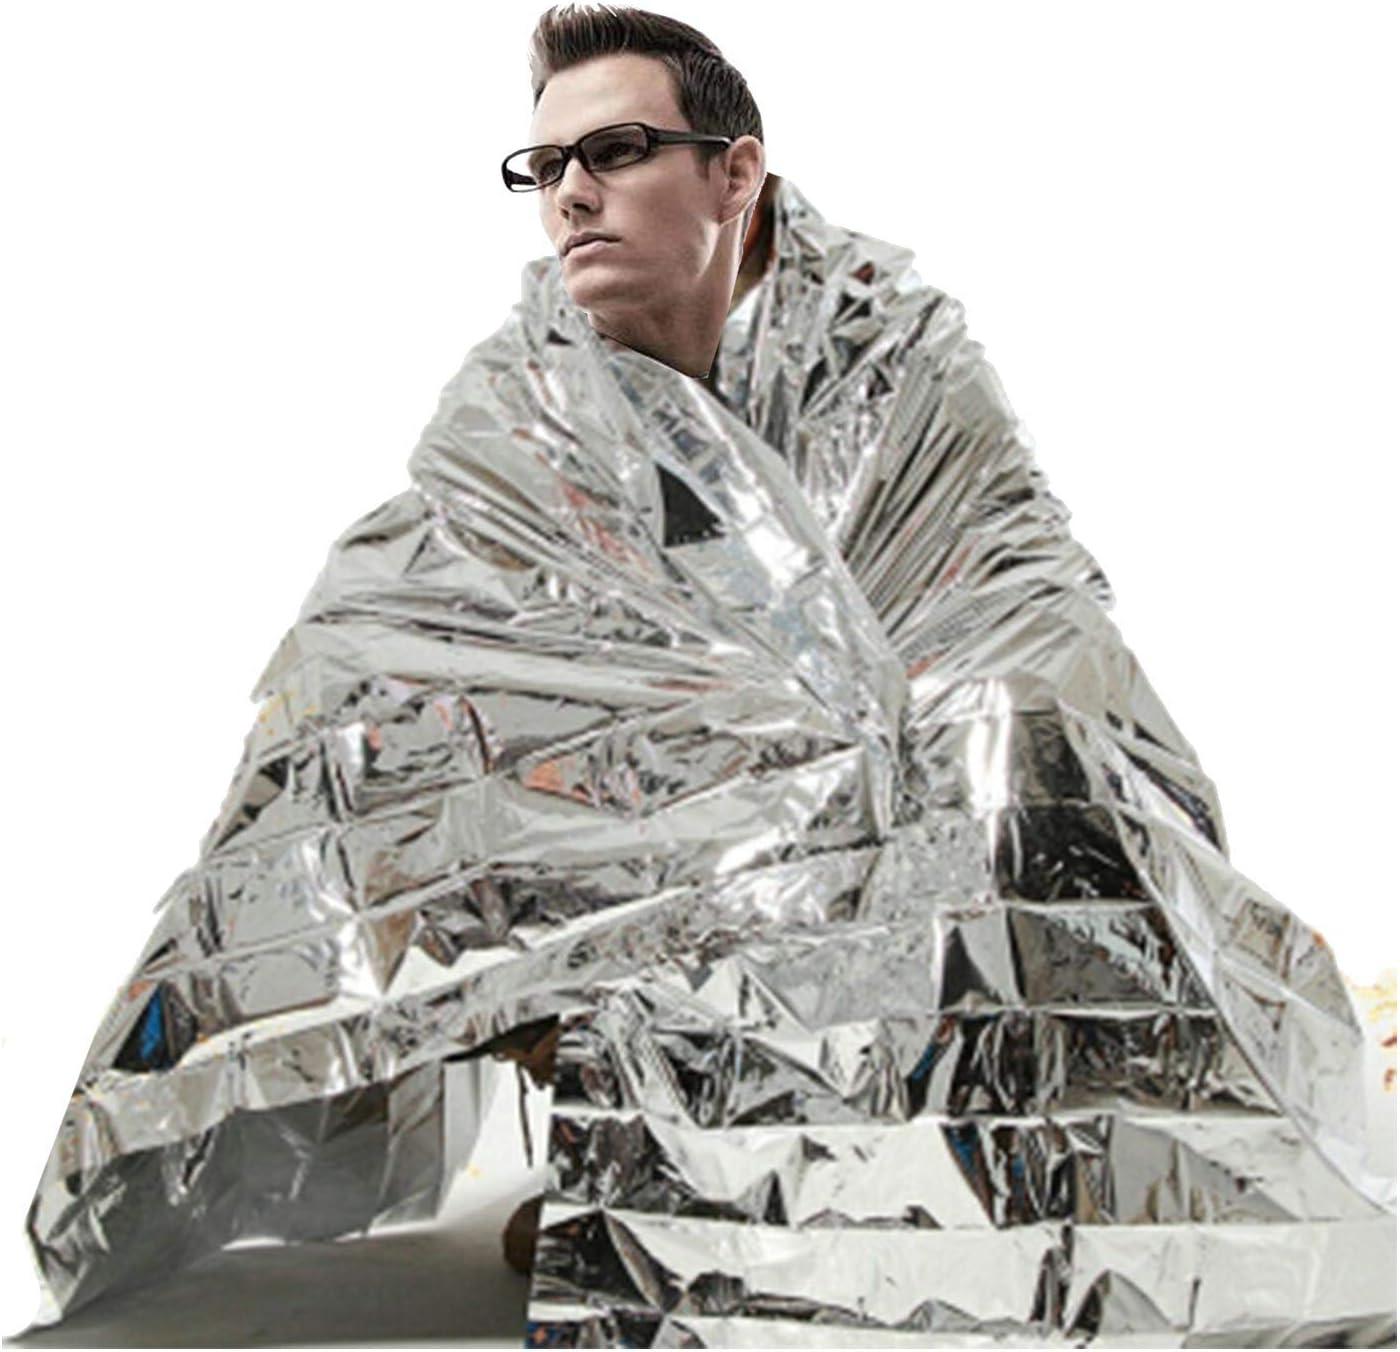 Grande urgence thermique Foil Blanket-Running Marathon Randonnée Camping First Aid